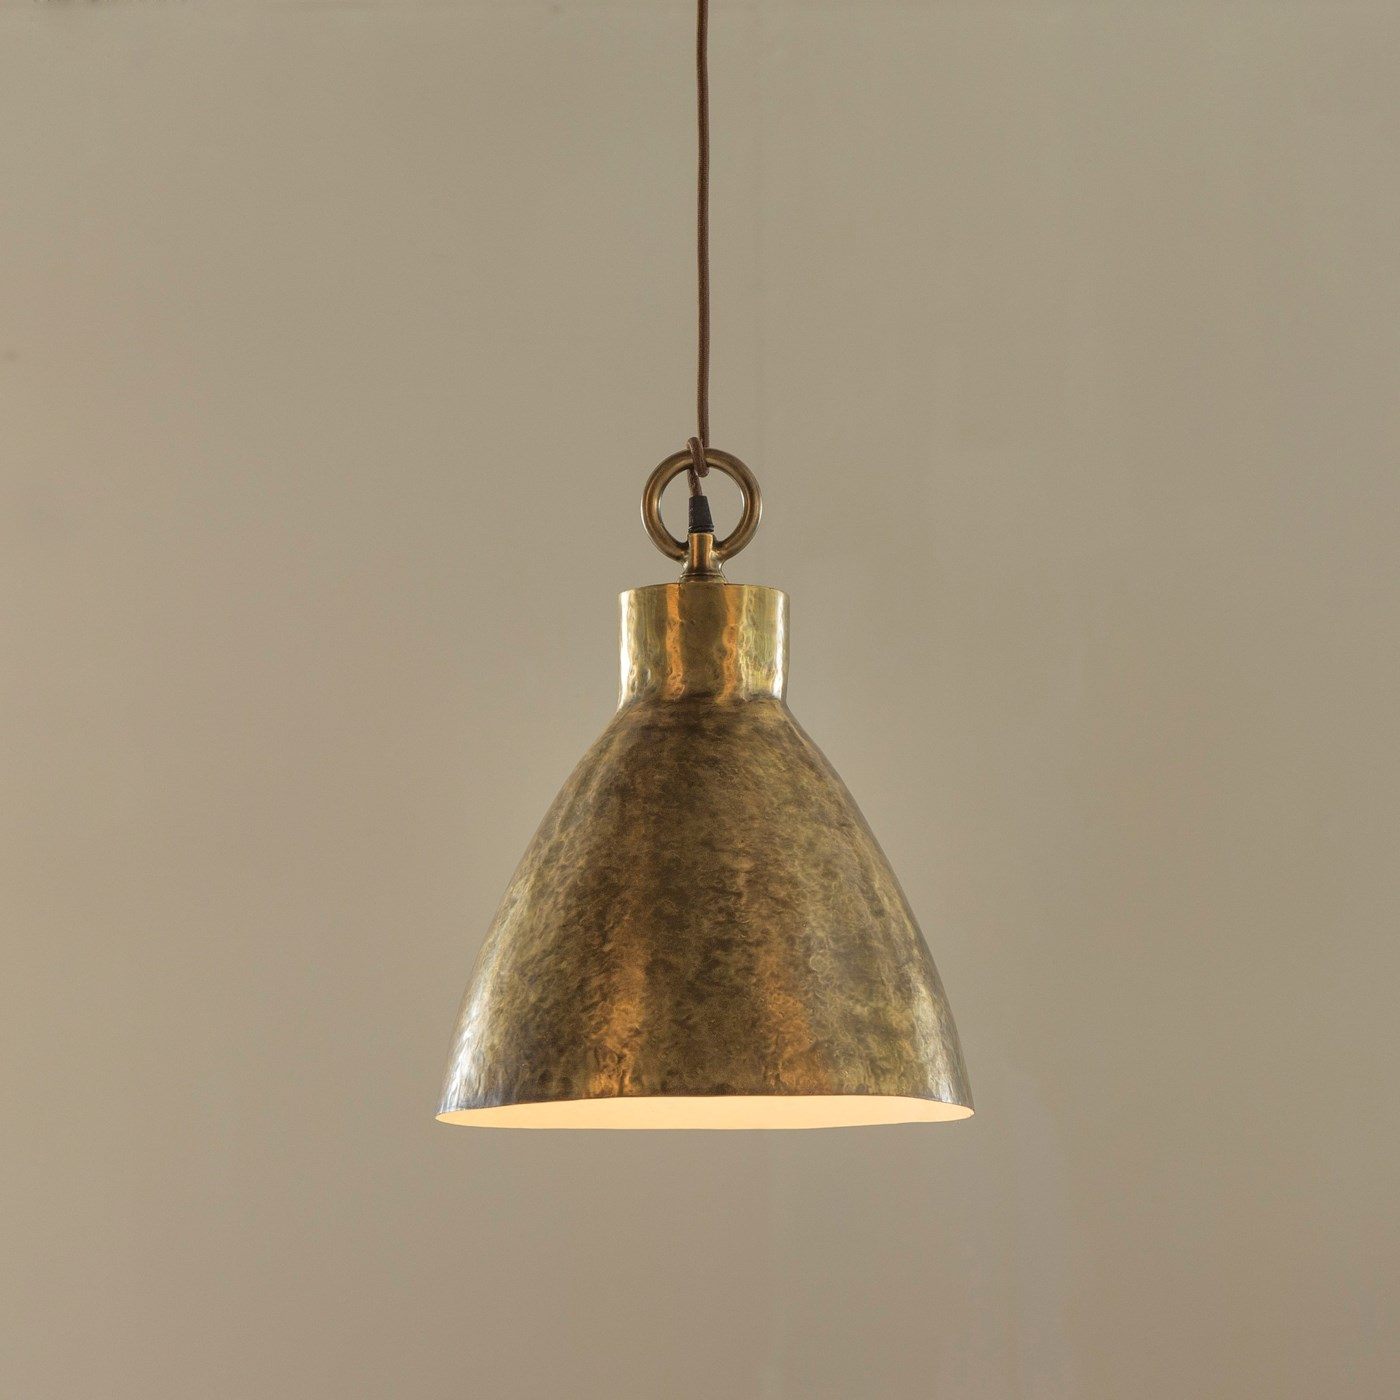 Parisian Atelier Pendant - Large / 120v US